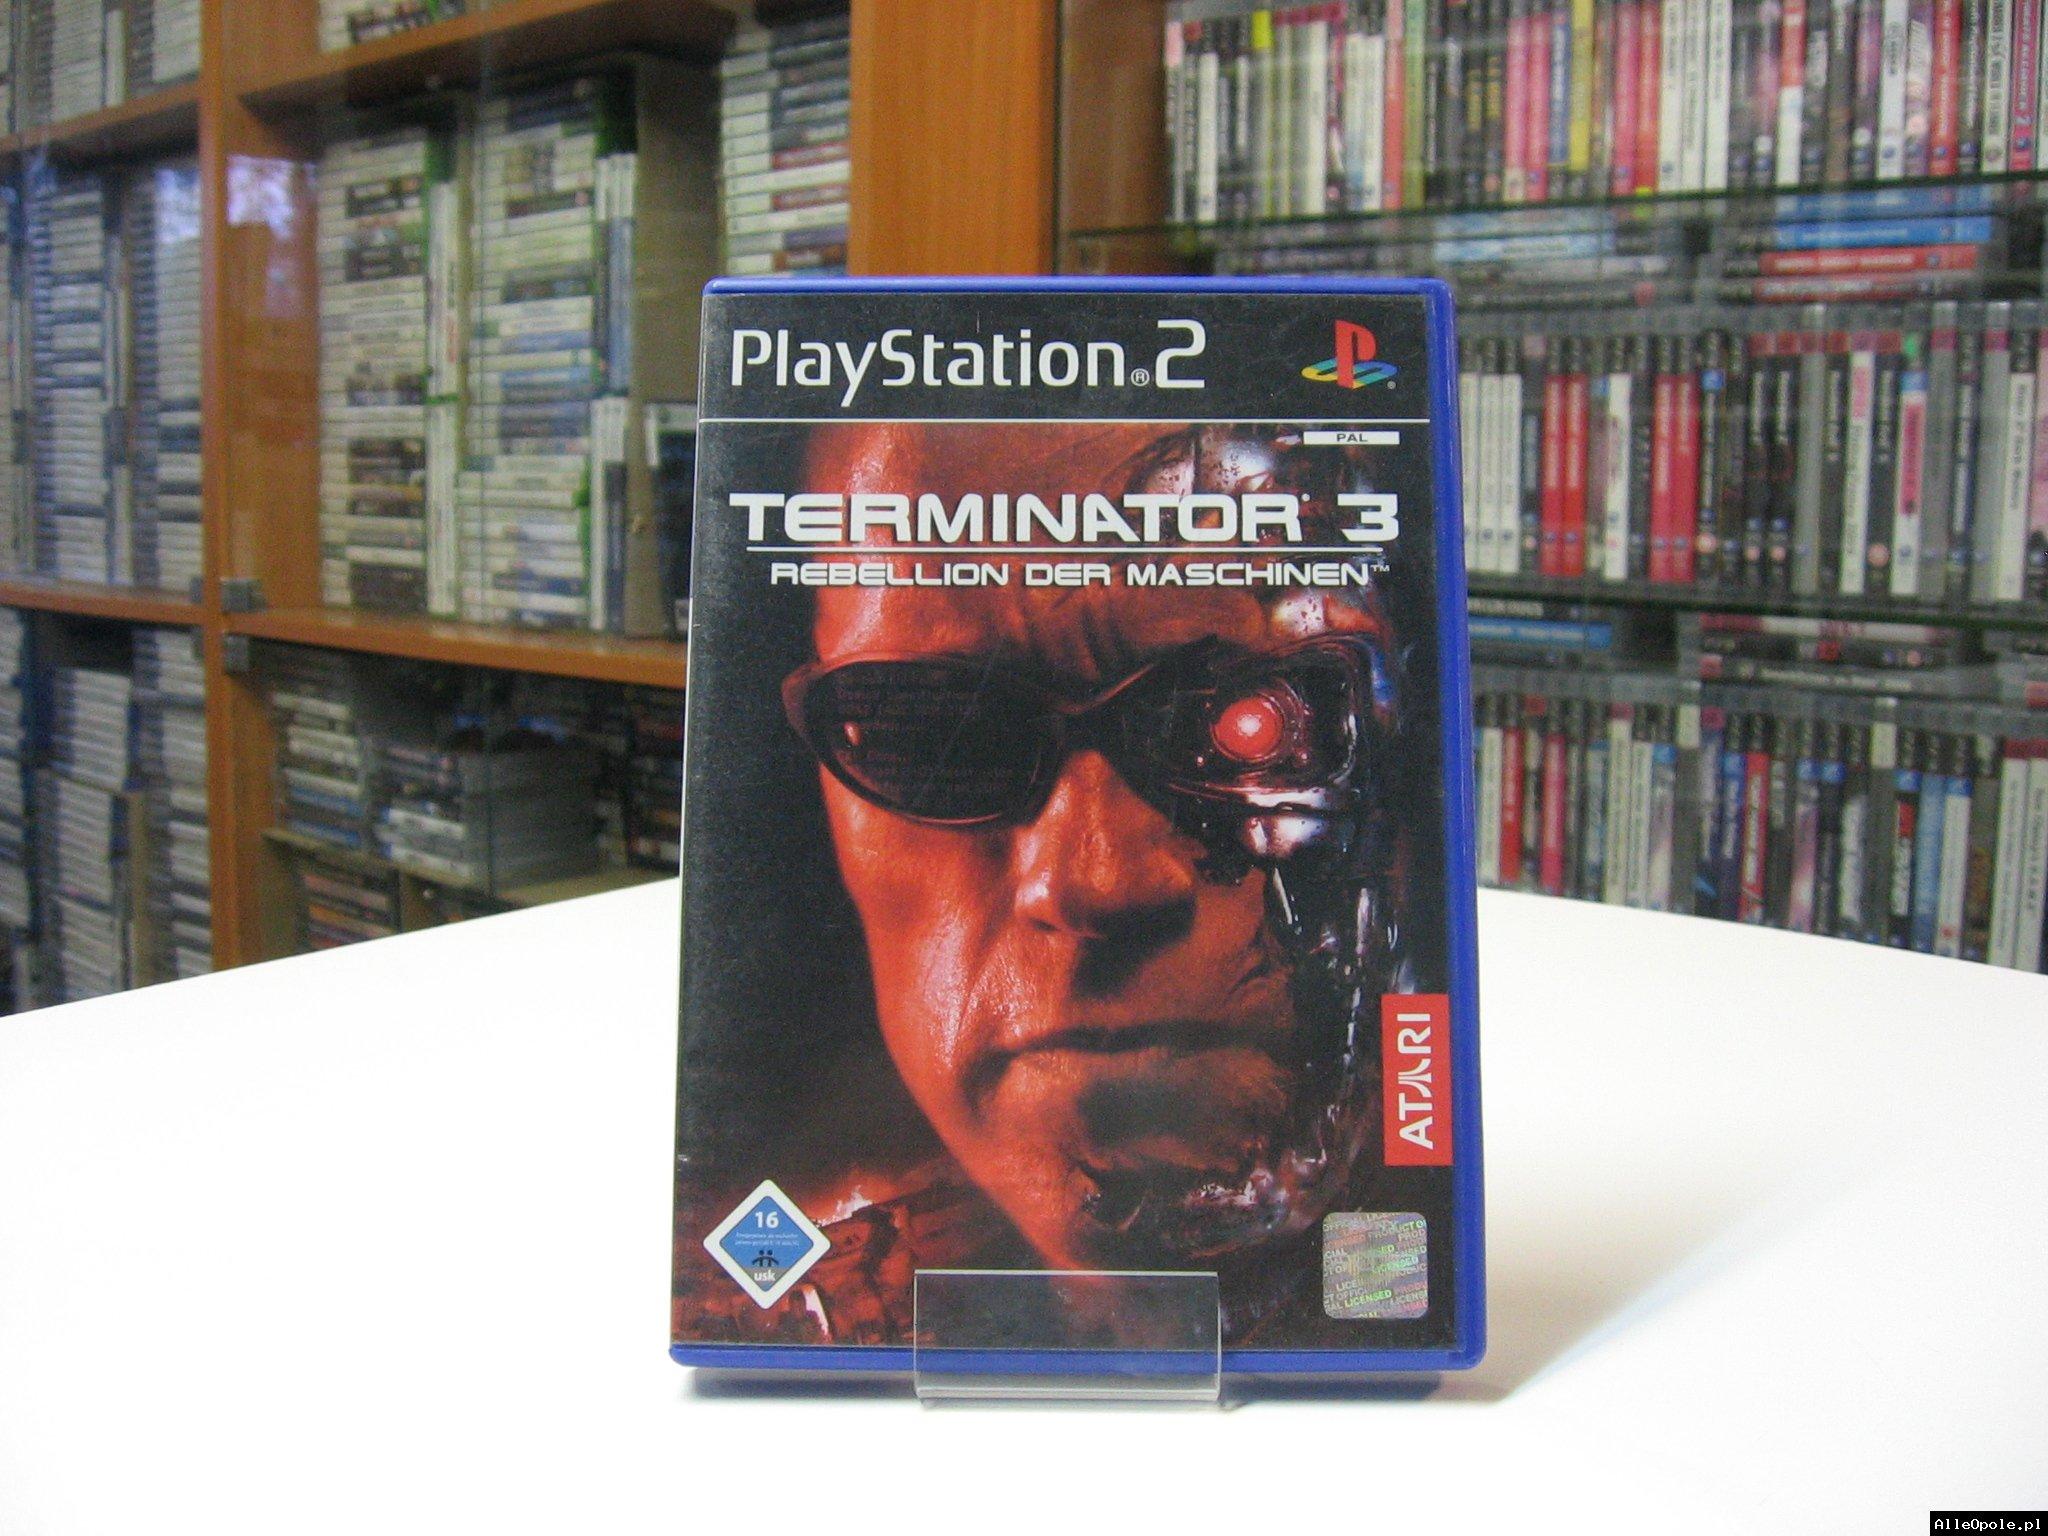 Terminator 3 - GRA Ps2 - Opole 0564